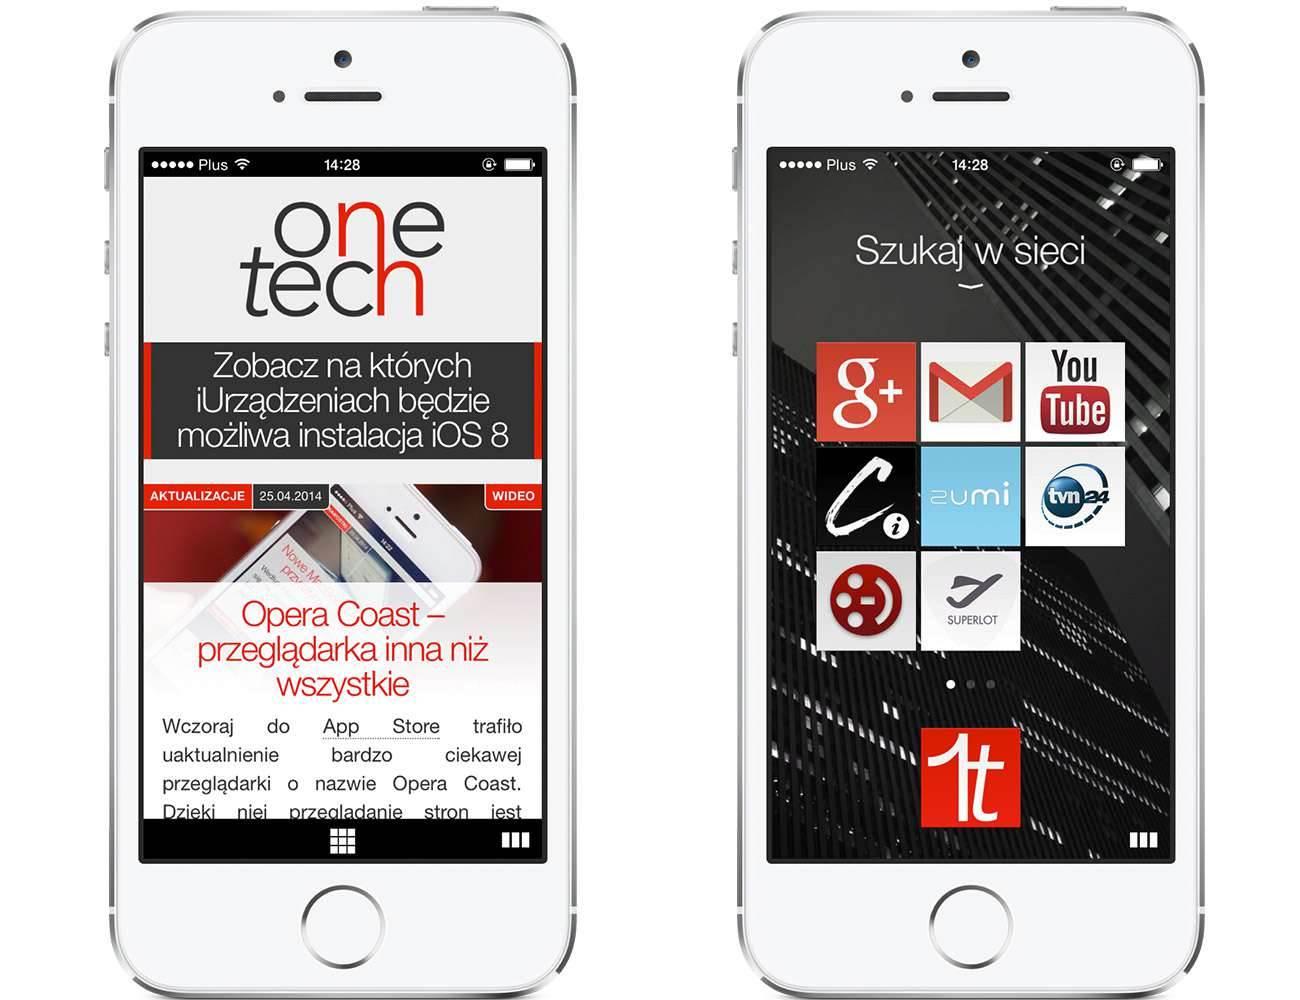 Opera.onetech.pl